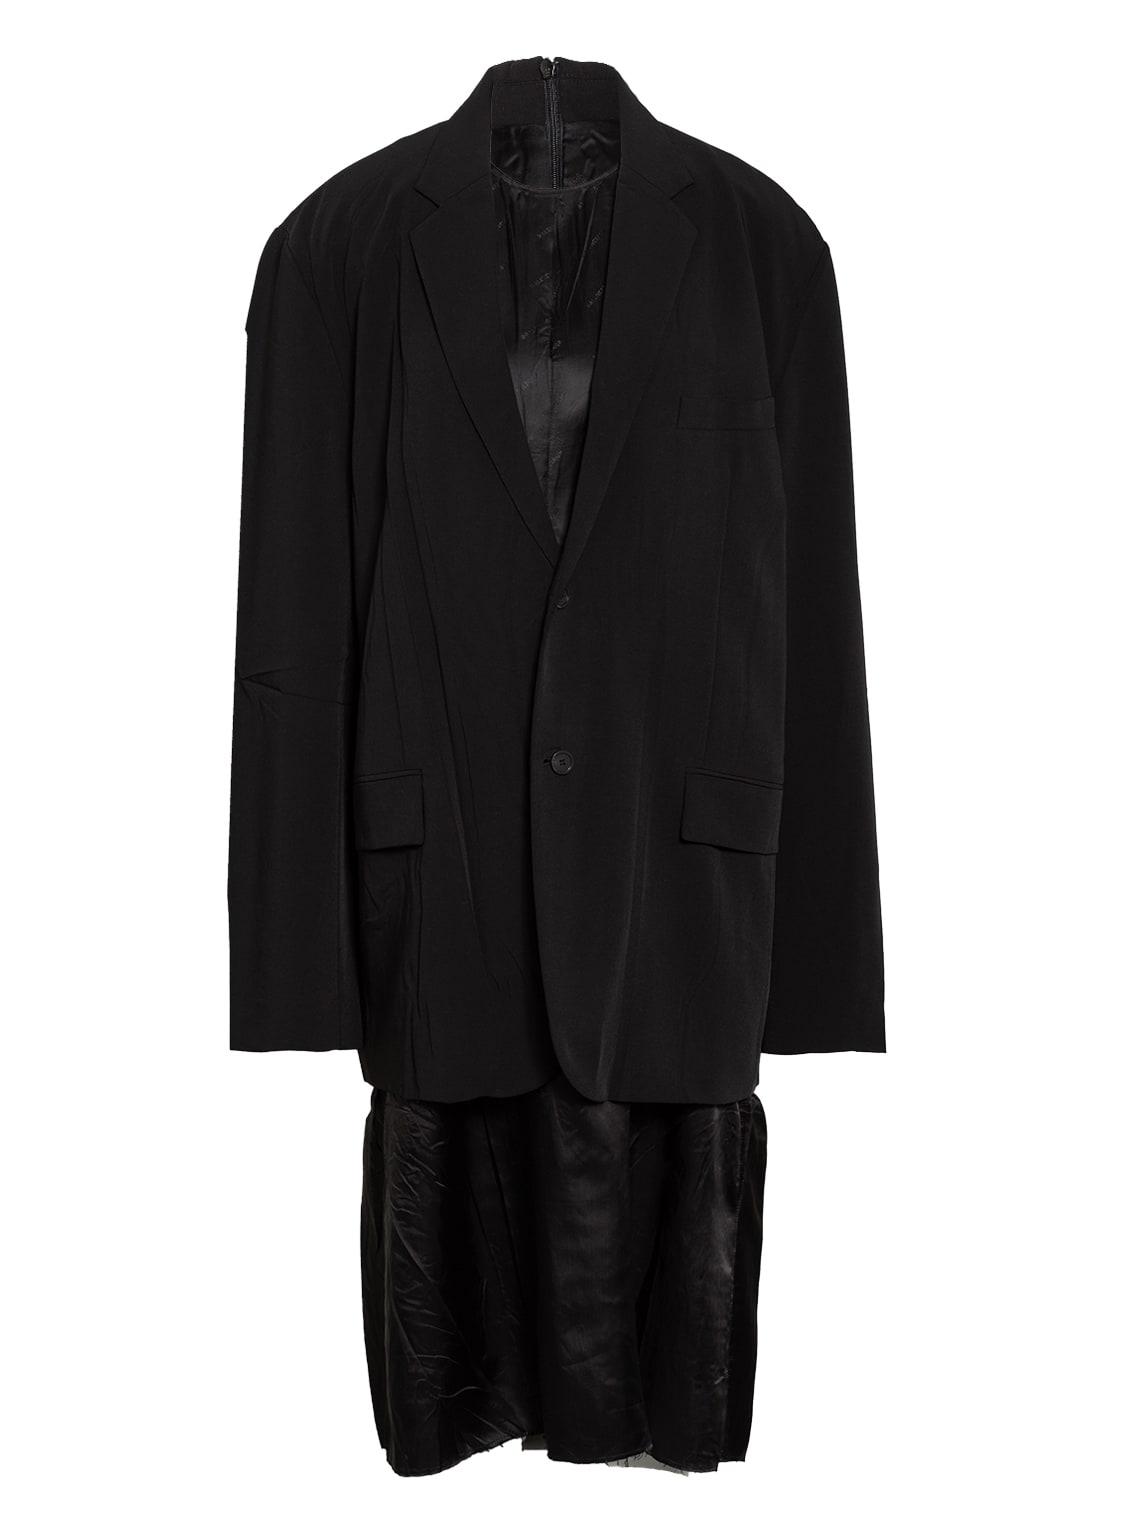 Image of Balenciaga 2-In-1-Kleid schwarz